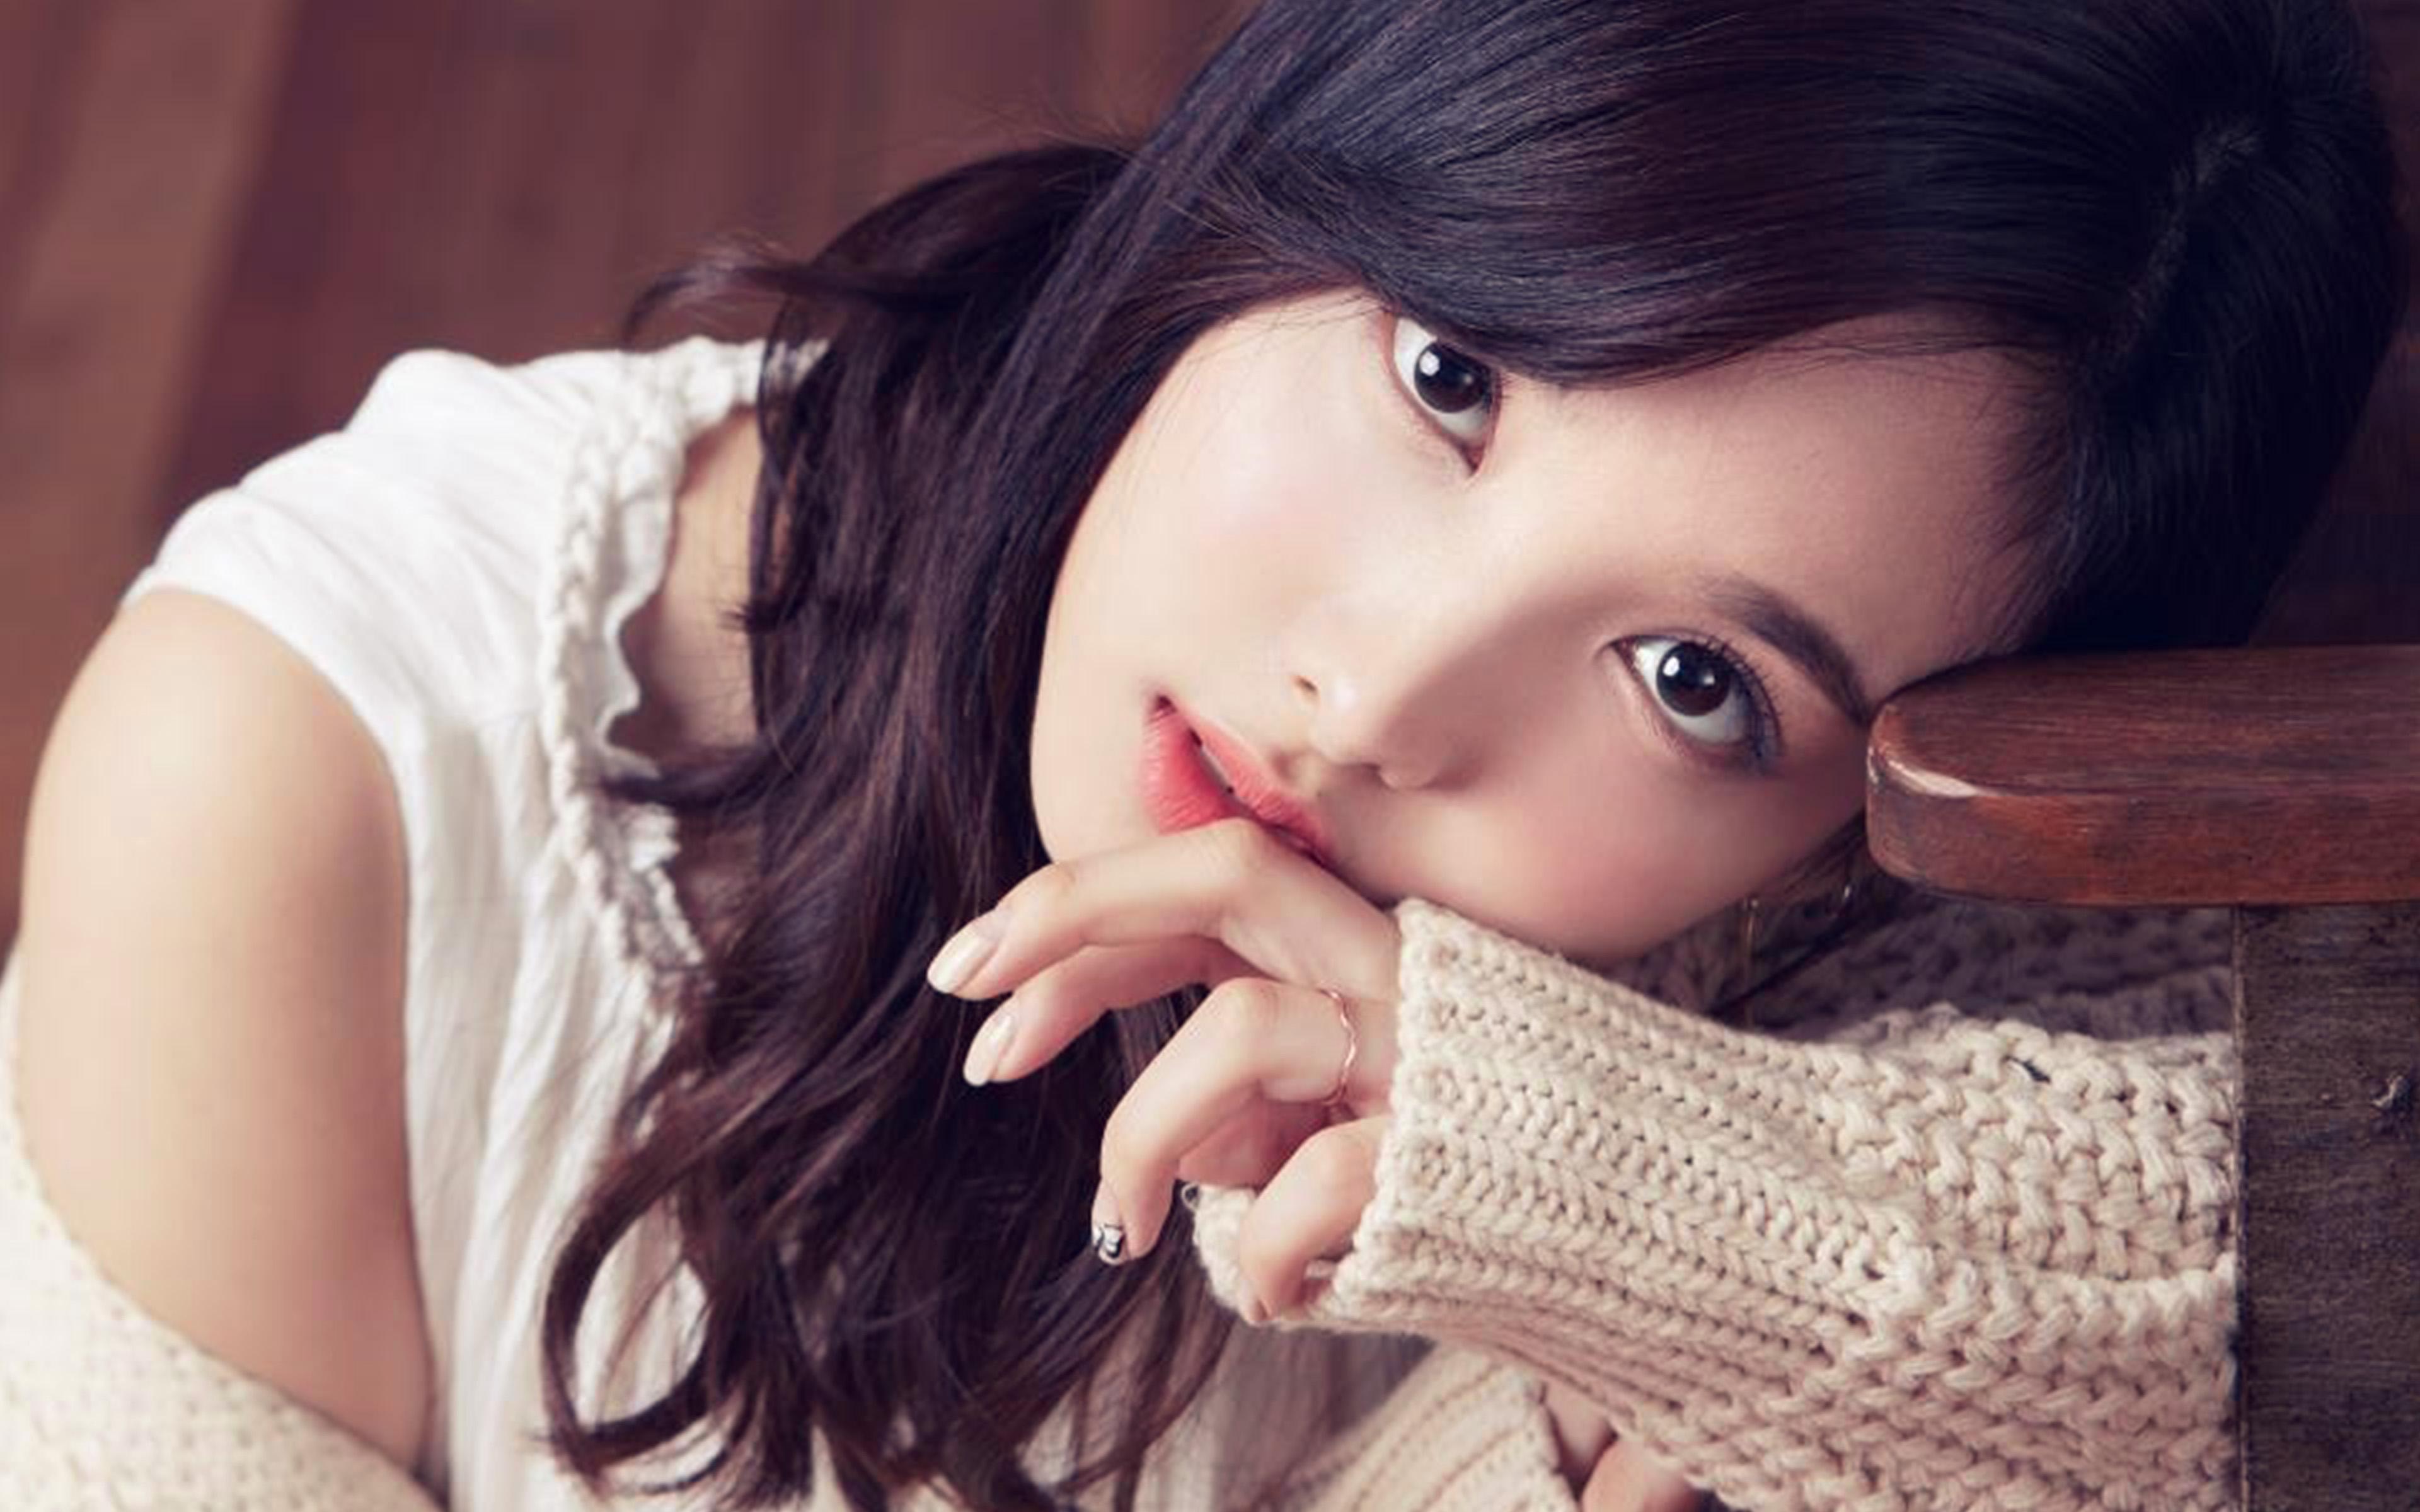 hp22-kpop-asian-girl-wallpaper